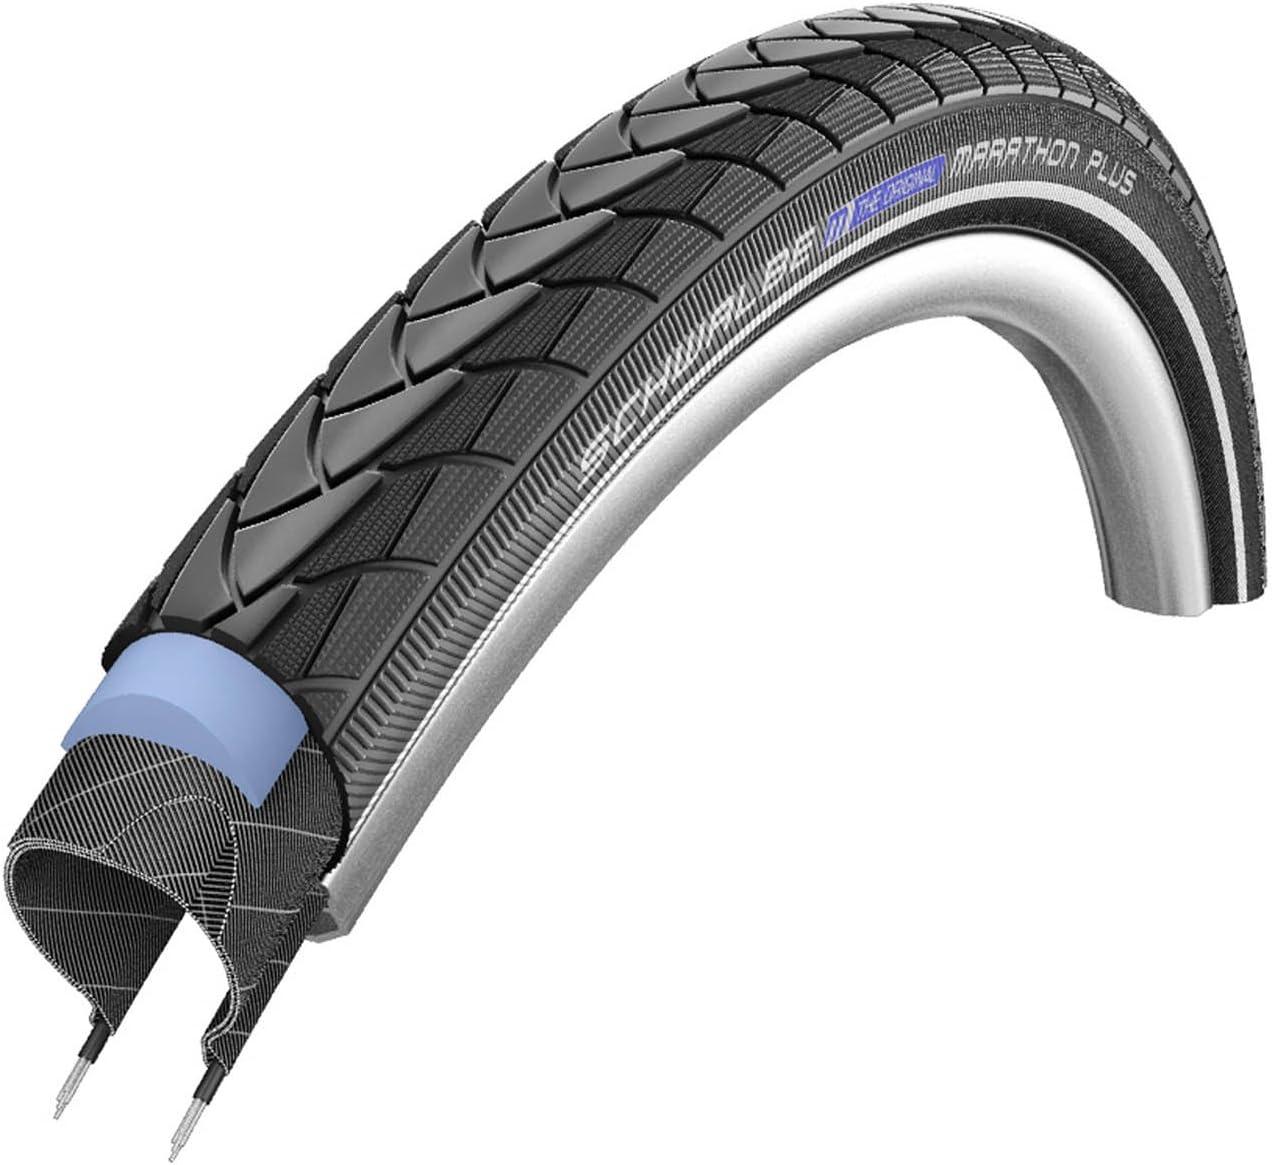 PAIR –Tube Option Available 700 x 32c Cycle Tyres Bike Schwalbe Marathon